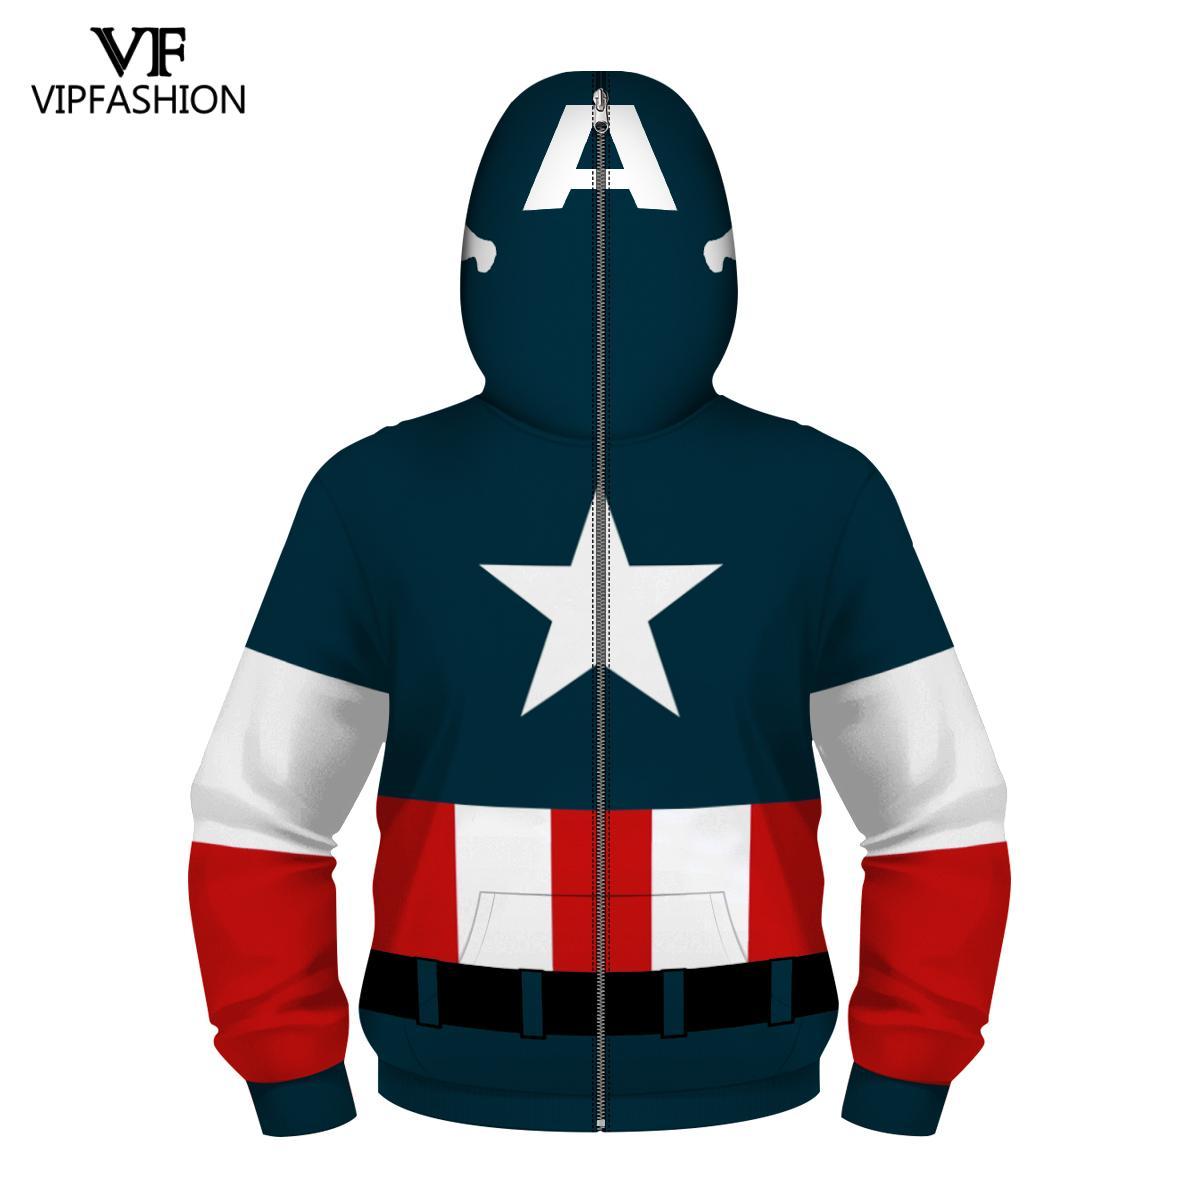 Image 3 - VIP FASHION Children's Boys Zpper Hoodies Avengers Marvel Superhero Iron Man Captain America Spiderman Kid Cartoon Jacket 4 13T-in Hoodies & Sweatshirts from Men's Clothing